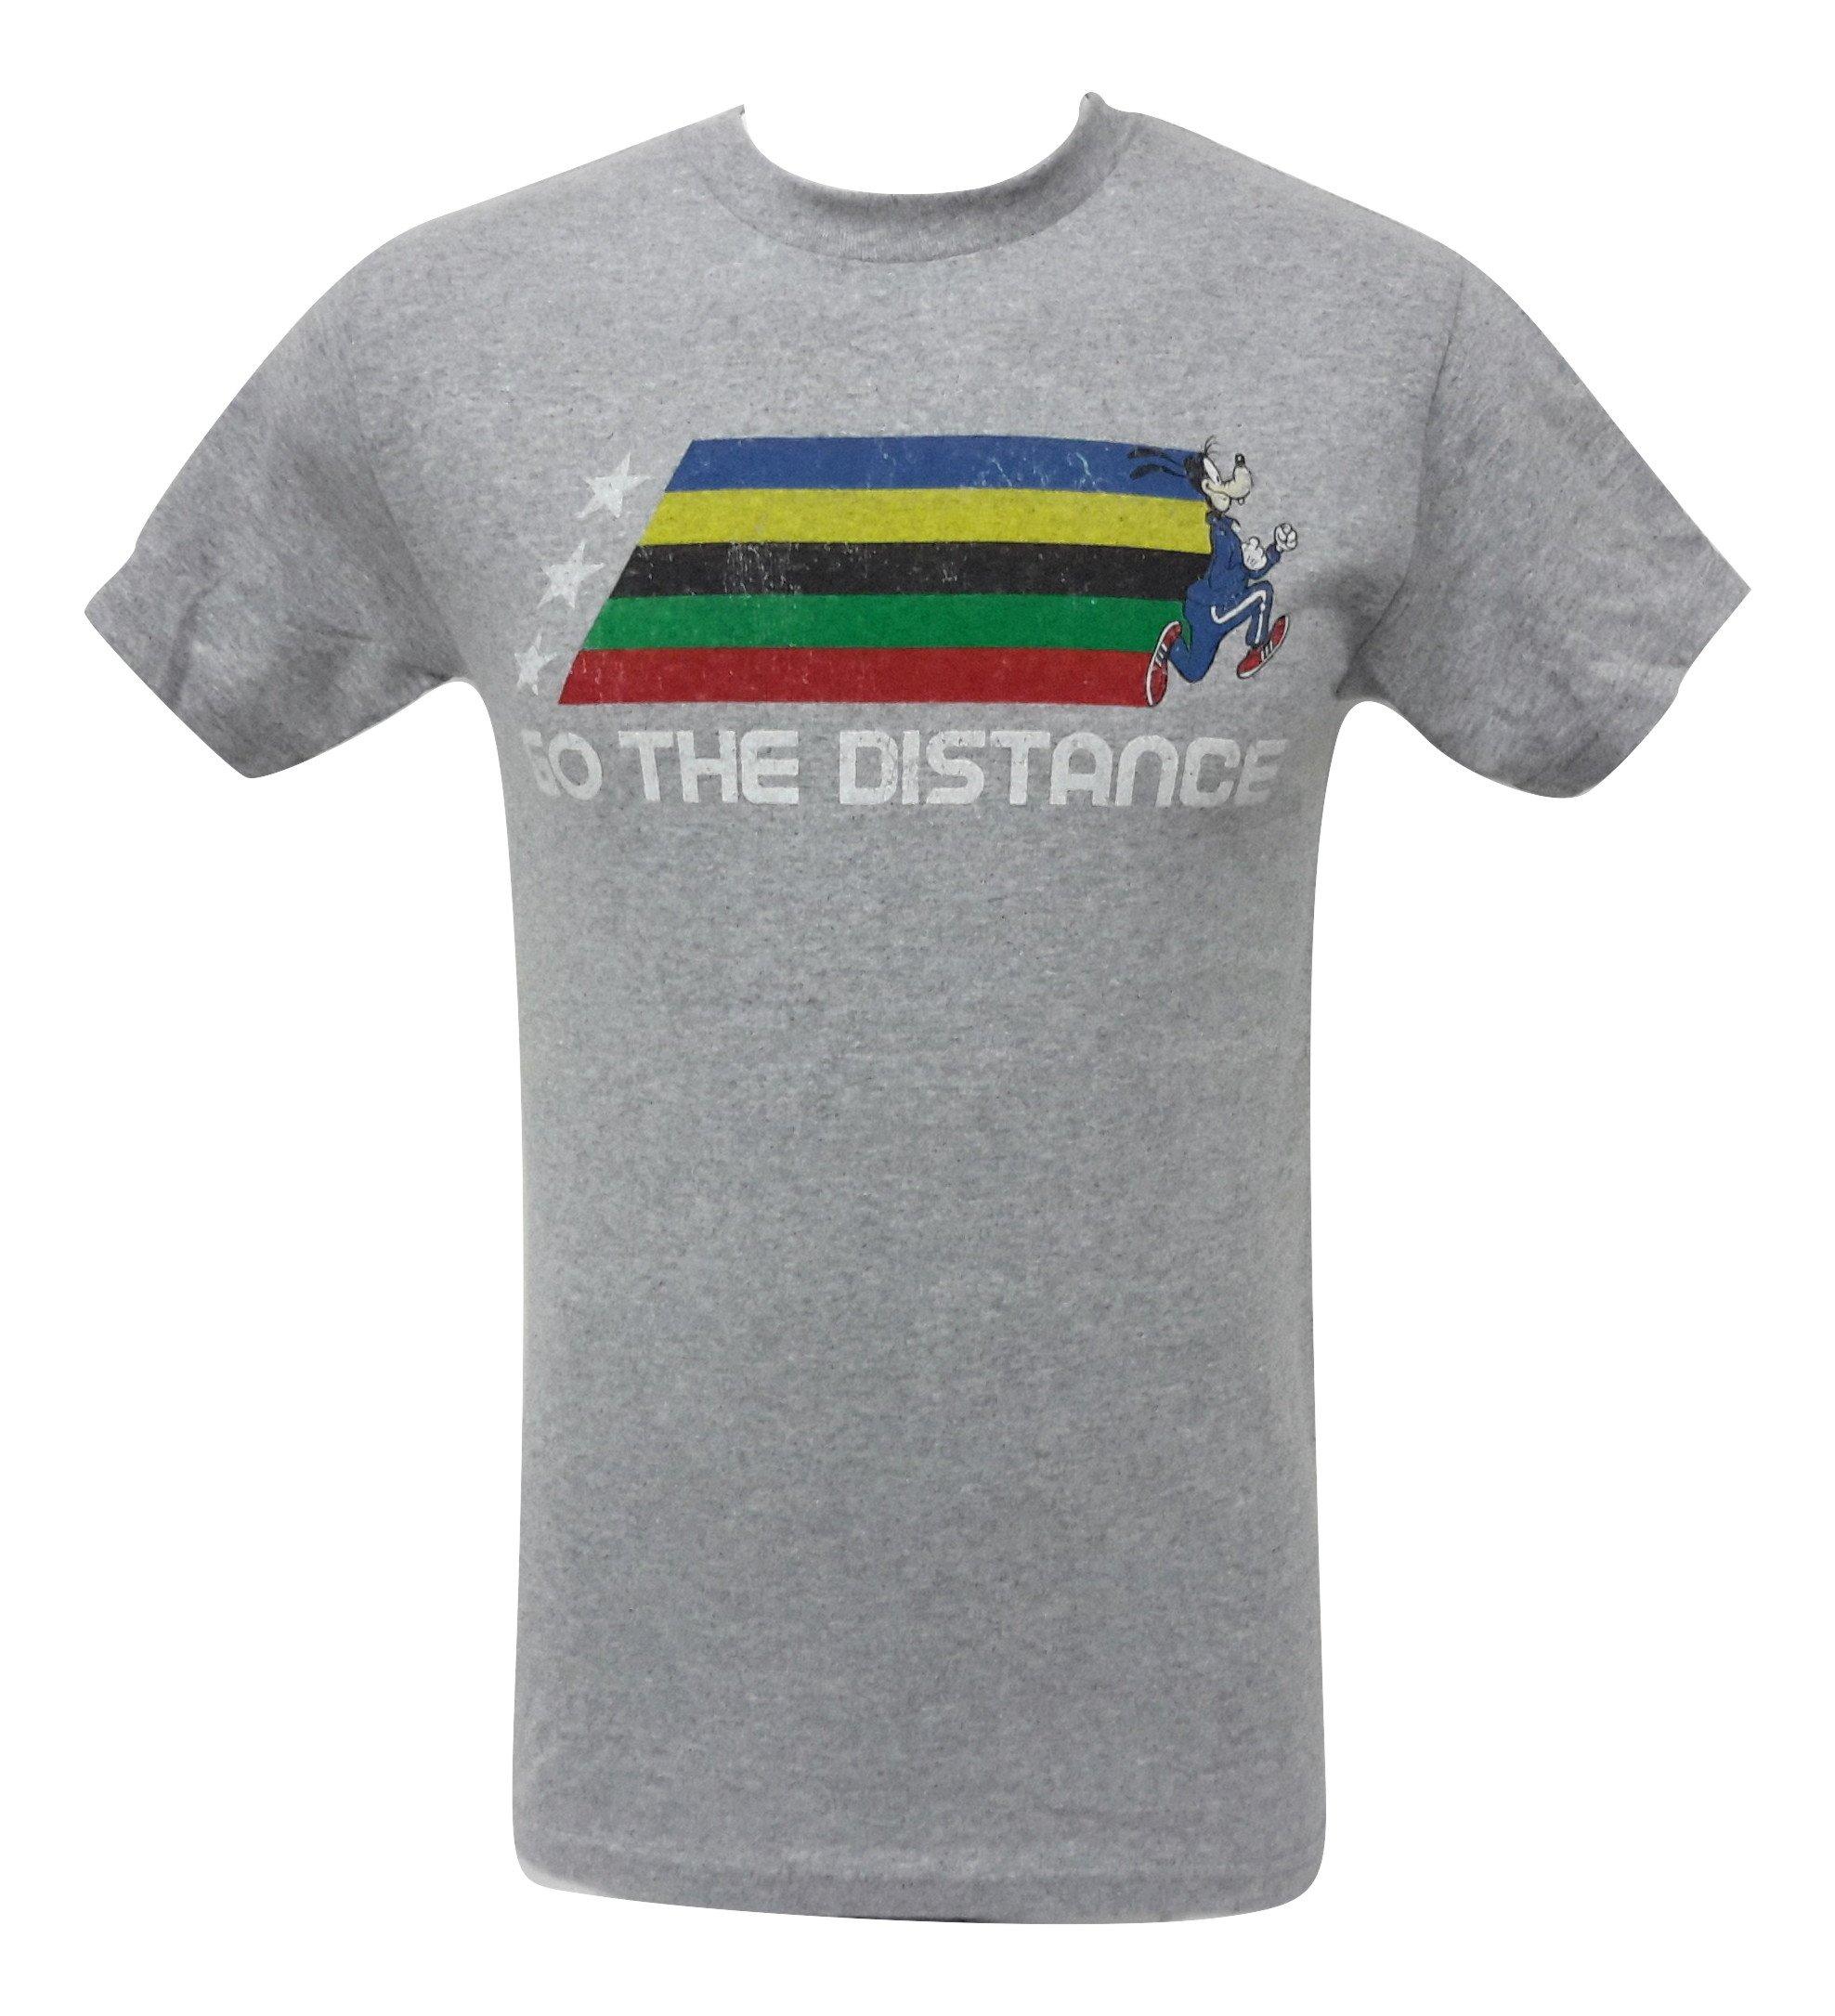 Disney - Goofy Go The Distance 2016 Rio Olympics Gray T Shirt